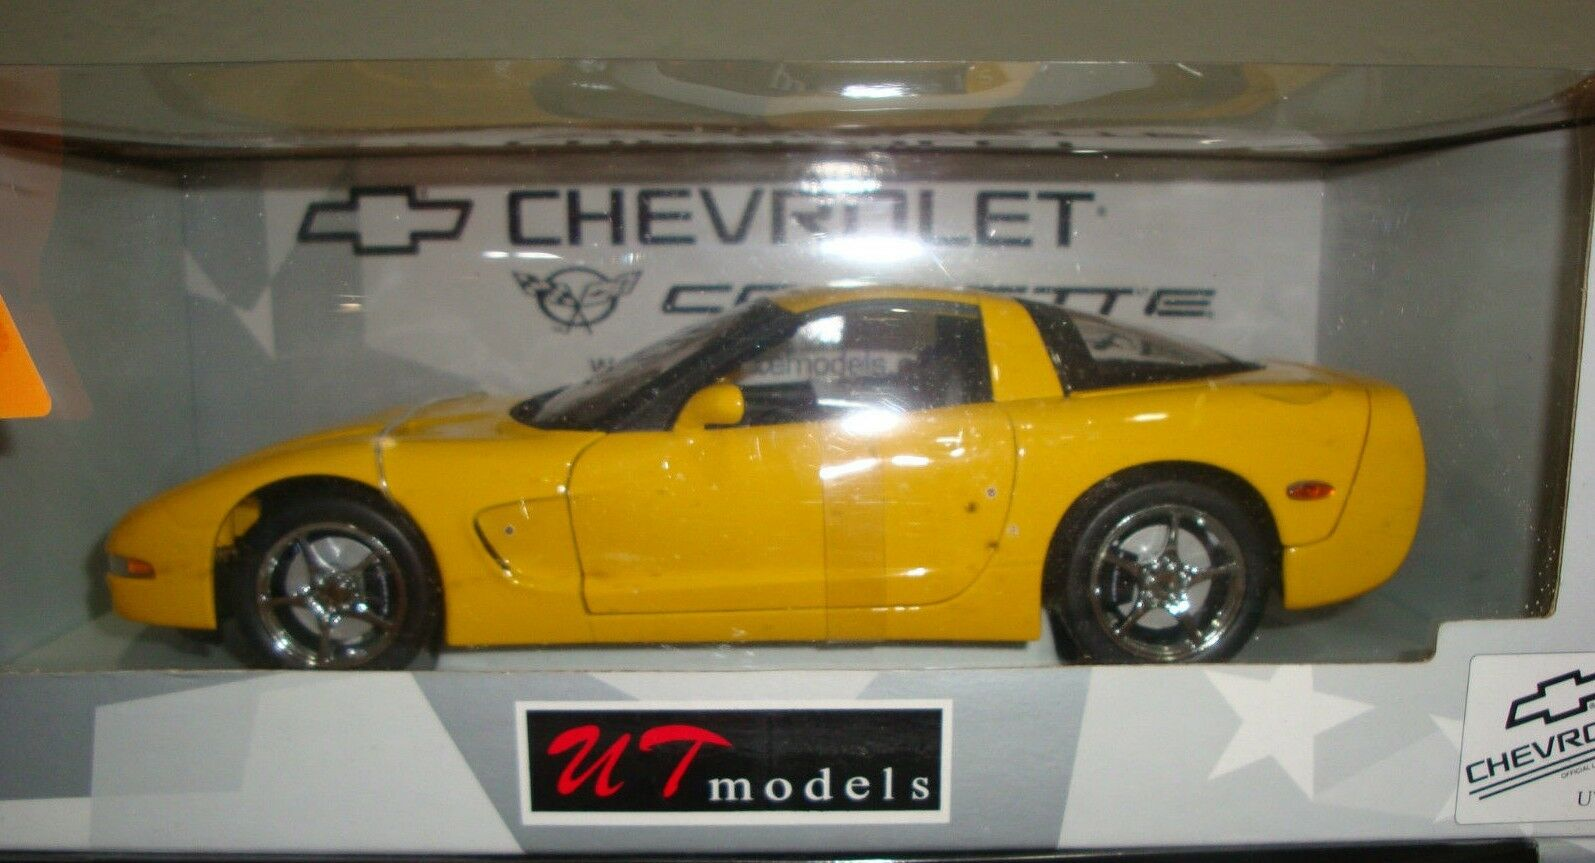 2000 Chevrolet Corvette C5 Coupe Yellow with Chrome Wheels 1 18 UT MODELS RARE